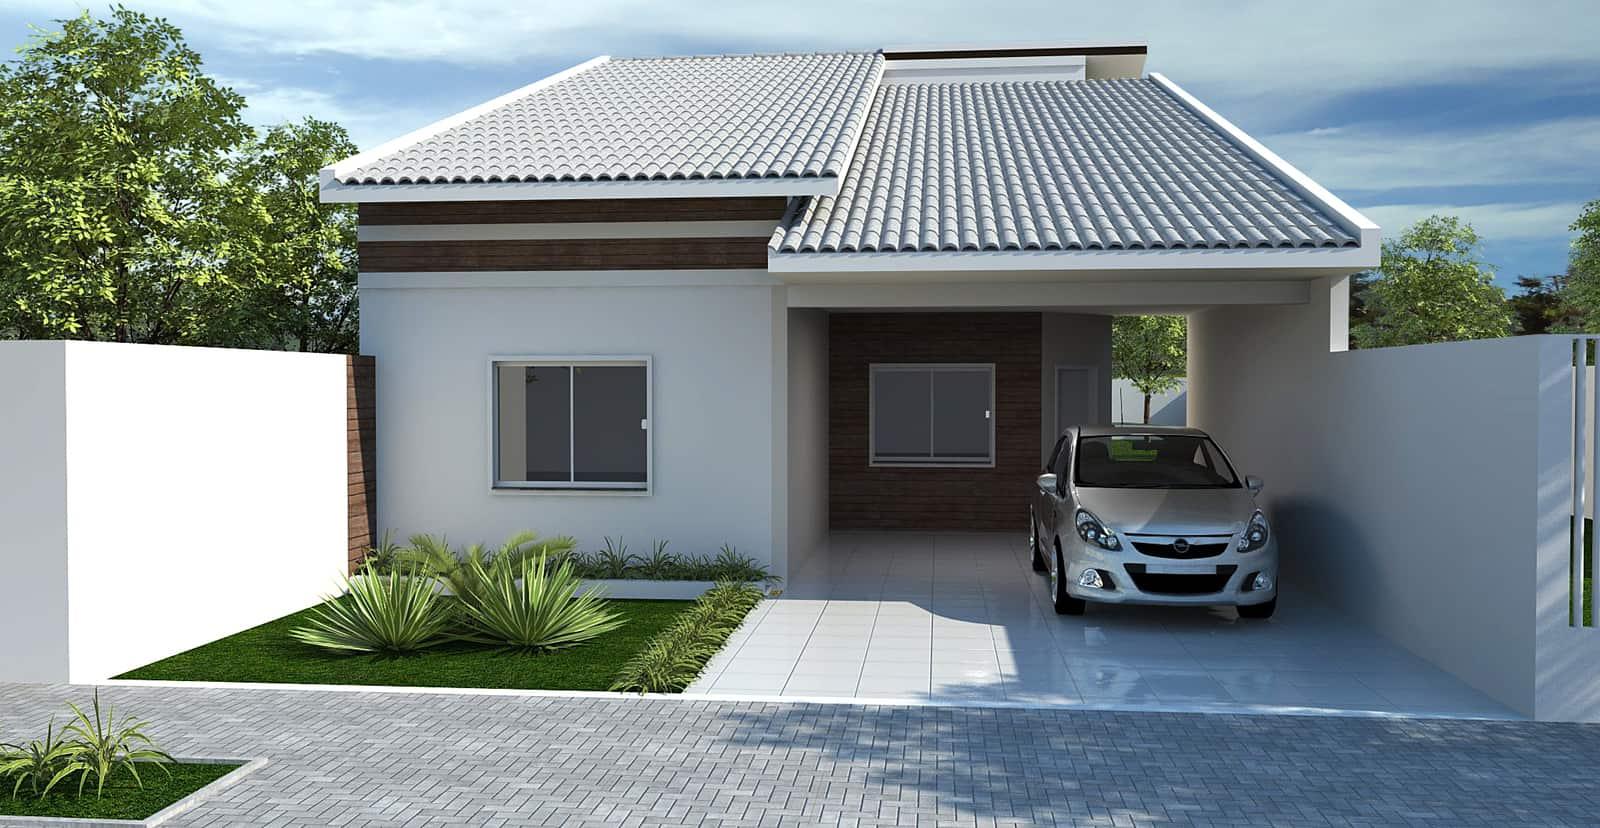 17 ideias de fachada para casas pequenas veja fotos for Casas casas